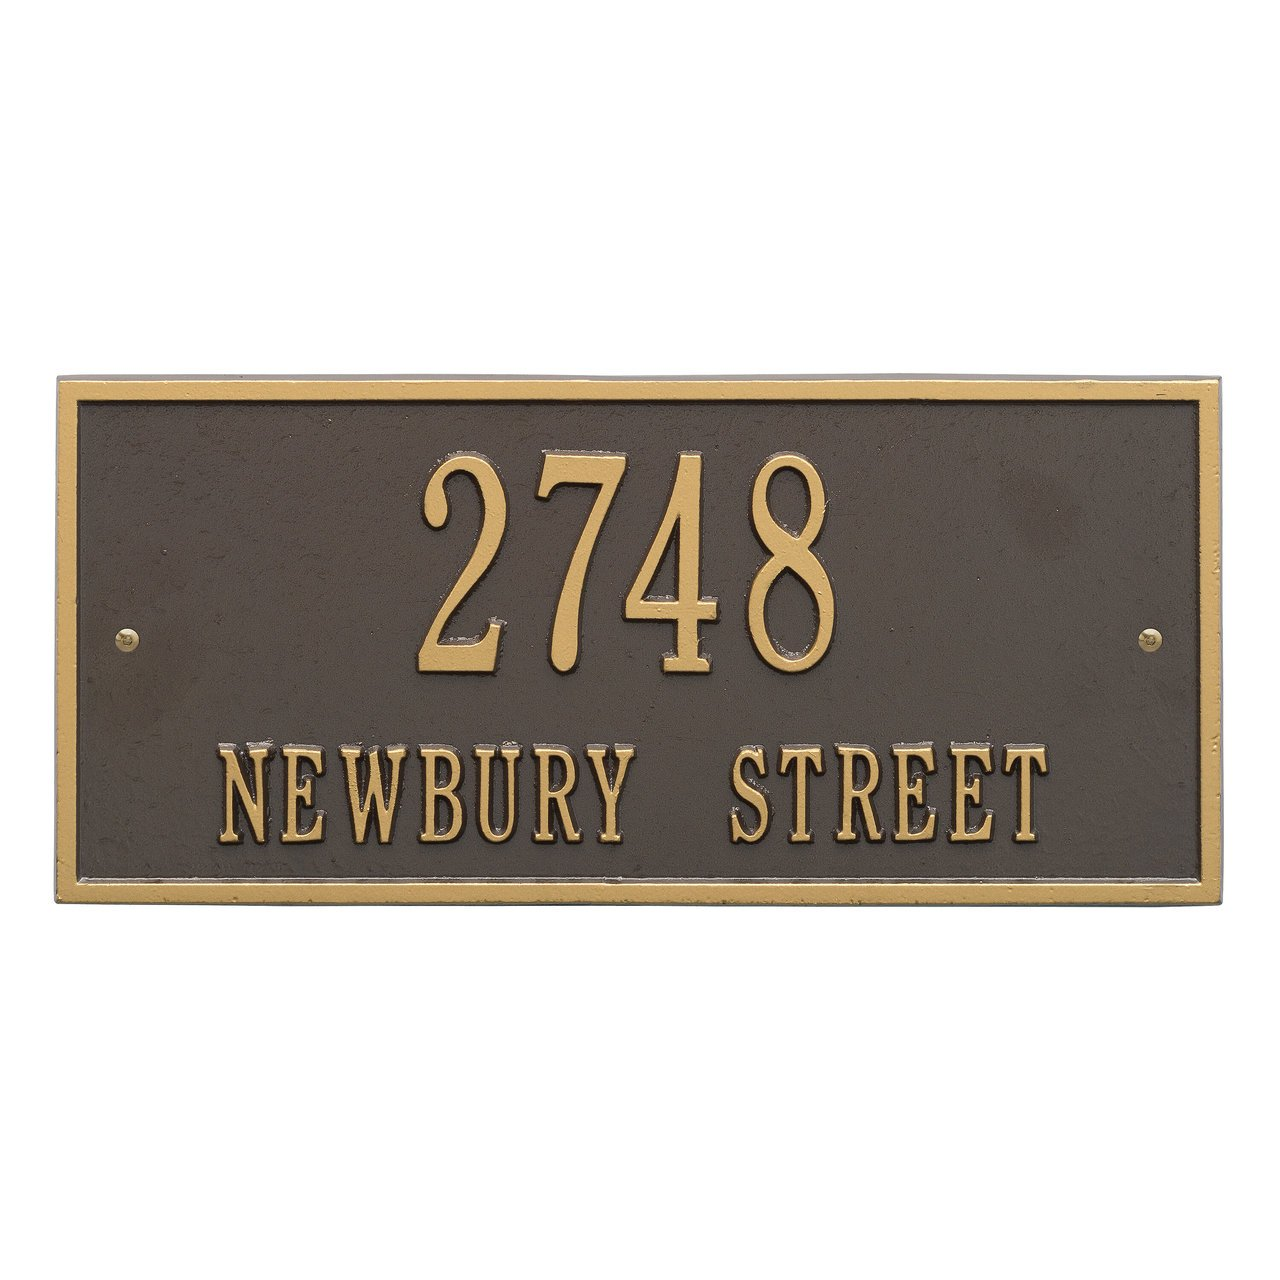 Customized Harford Address Plaque 2 Lines 16'W x 7'H Whitehall